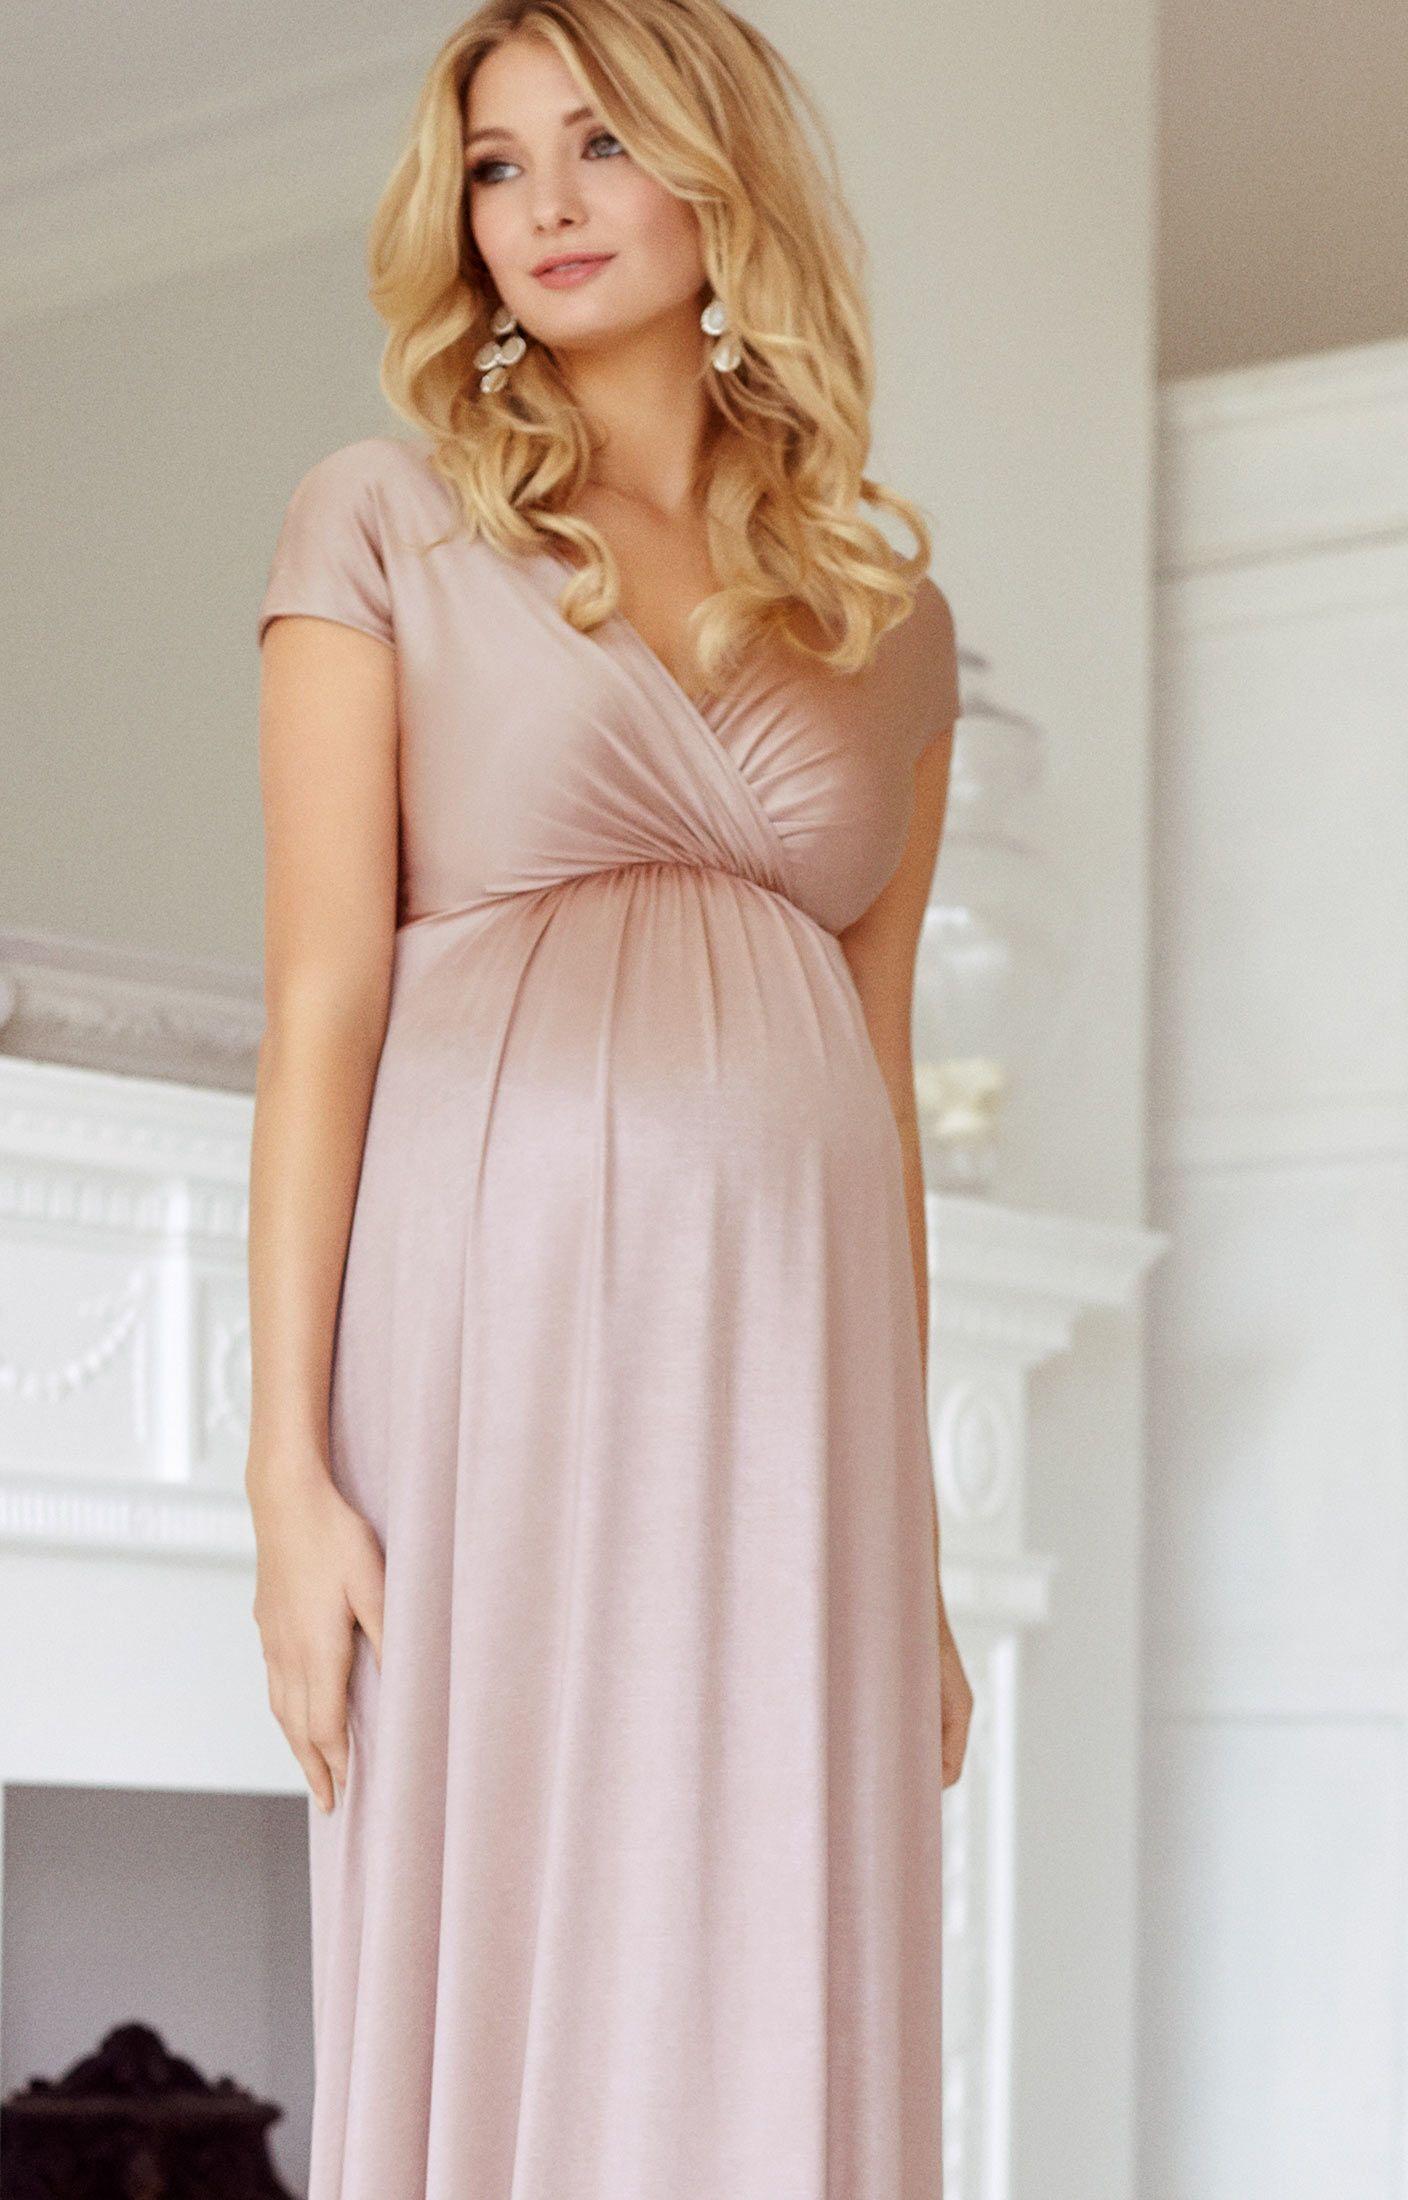 63cd0e8d1e Blush Maternity Wedding Dress - Gomes Weine AG